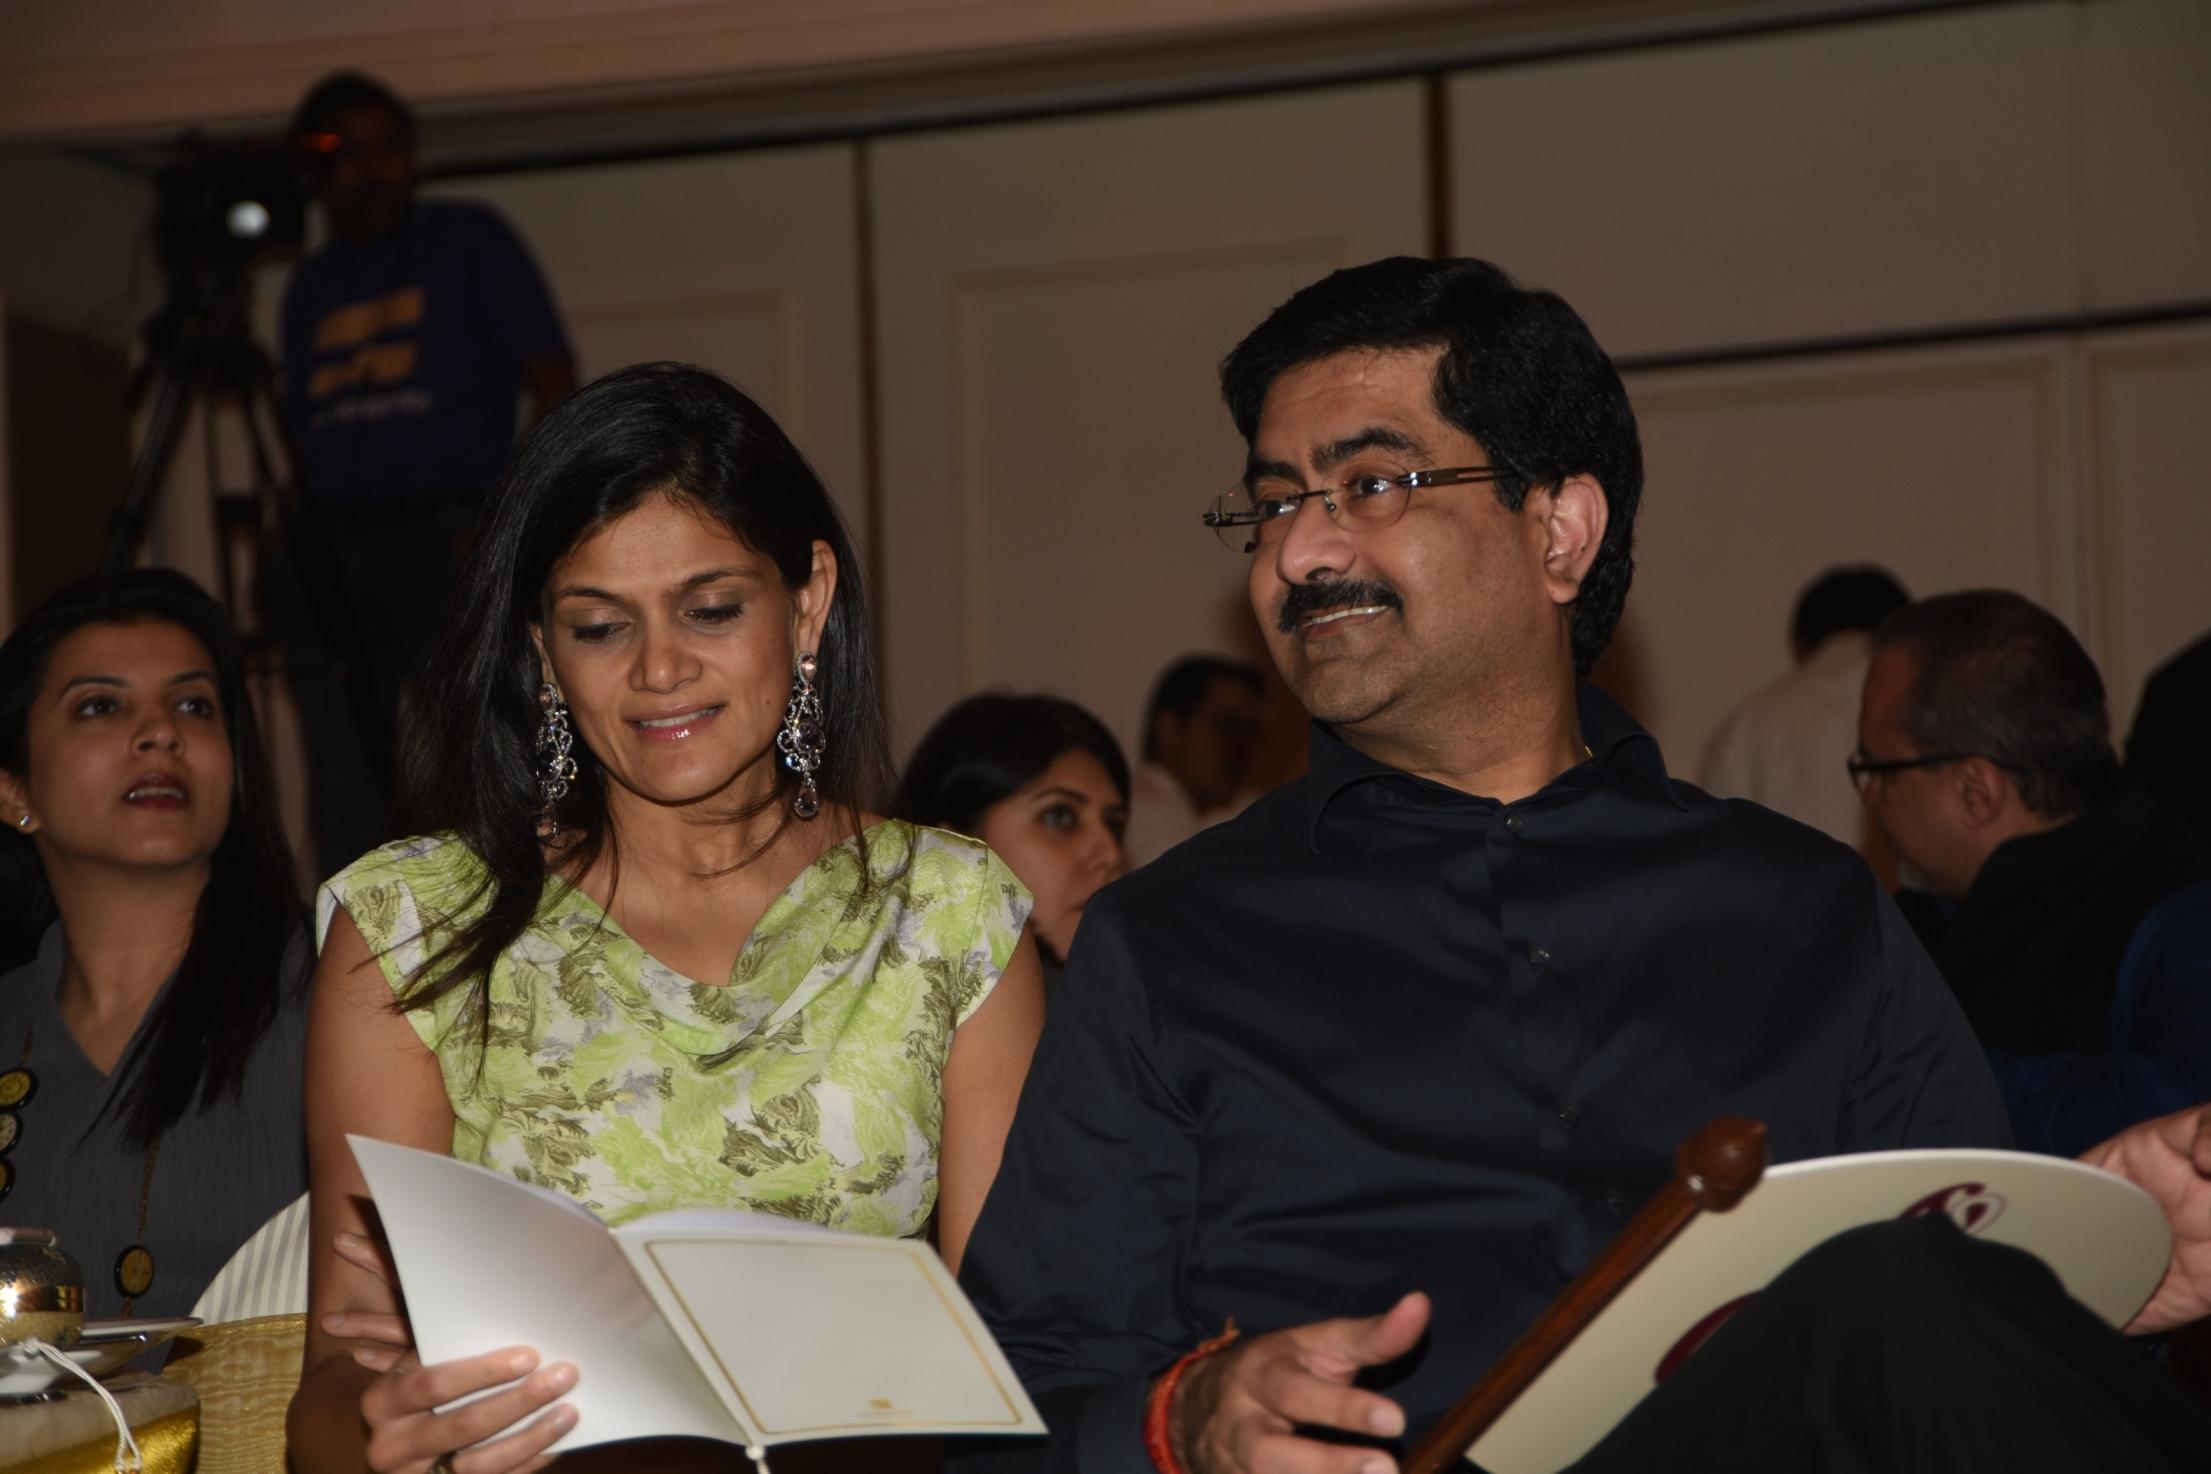 Neerja and Kumarmangalam Birla